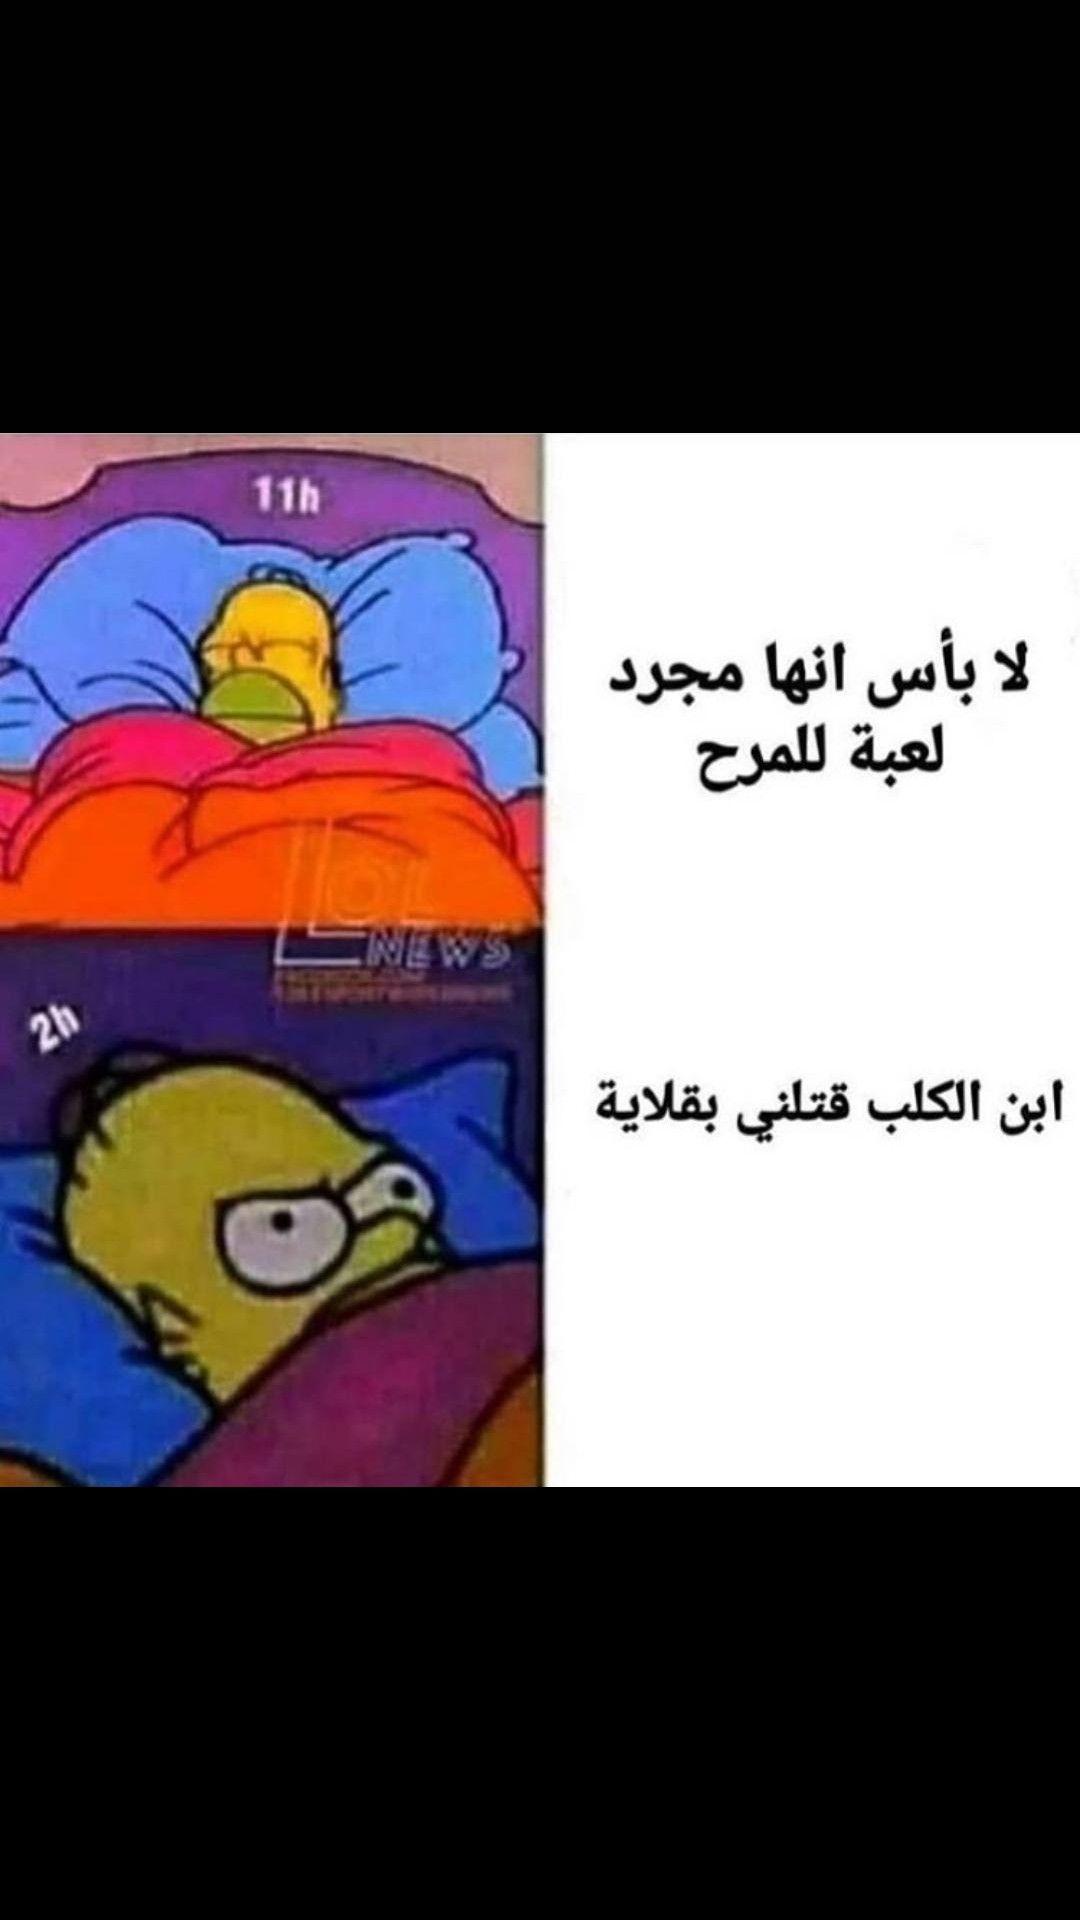 Pin By Jojo On استهبال Arabic Funny Anime Funny Funny Jokes